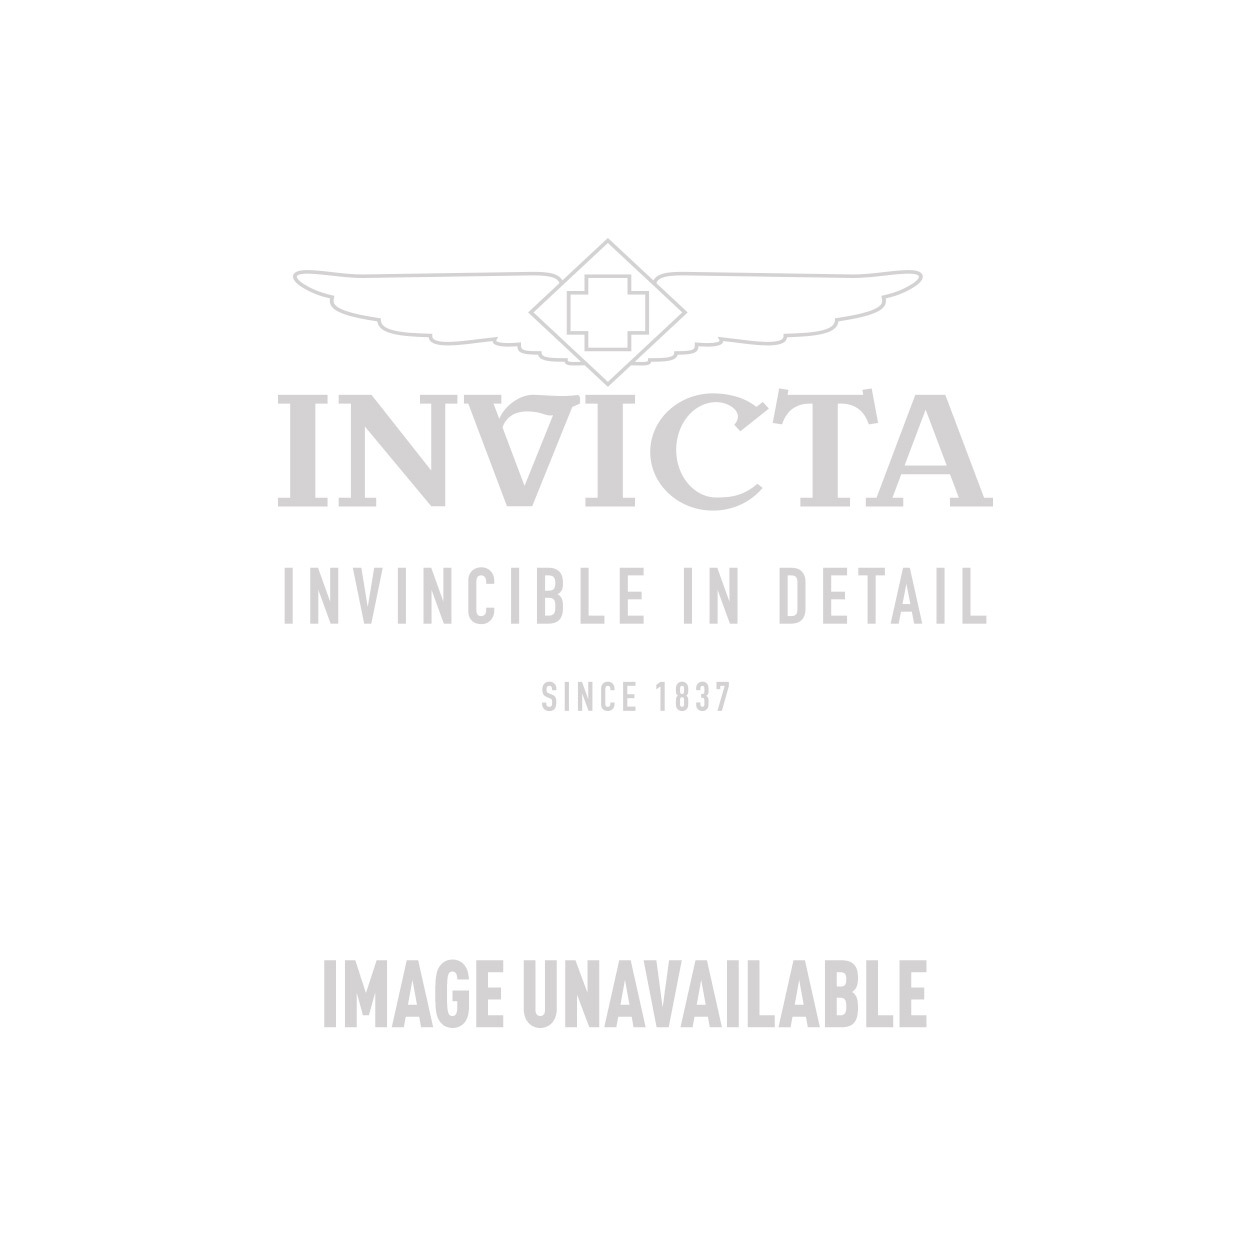 INVICTA Jewelry Divina Bracelets 22 7.8 Silver 925 Rhodium - Model J0027